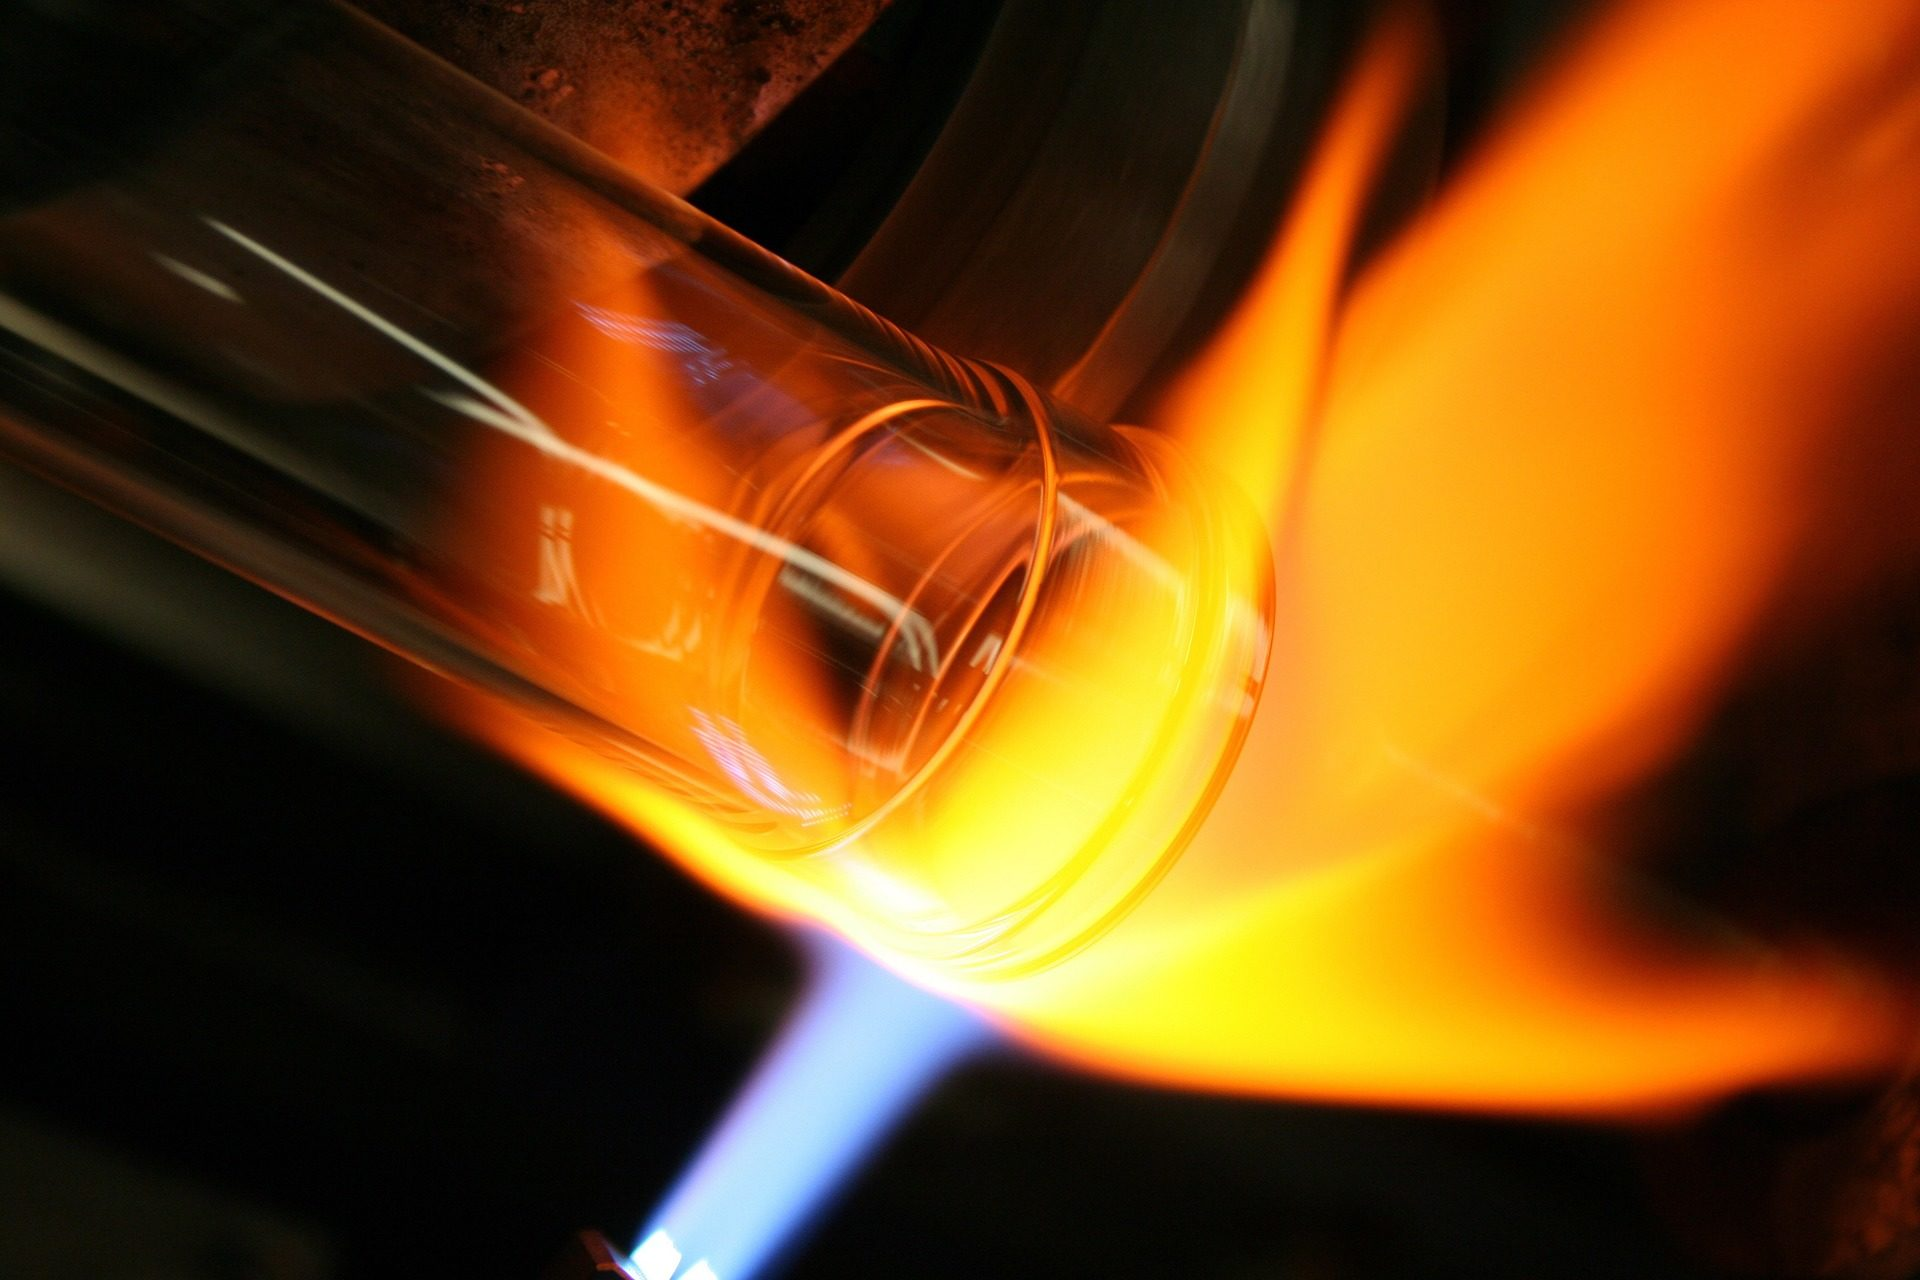 verre, Crystal, moulage par, de fabrication, feu, flamme - Fonds d'écran HD - Professor-falken.com